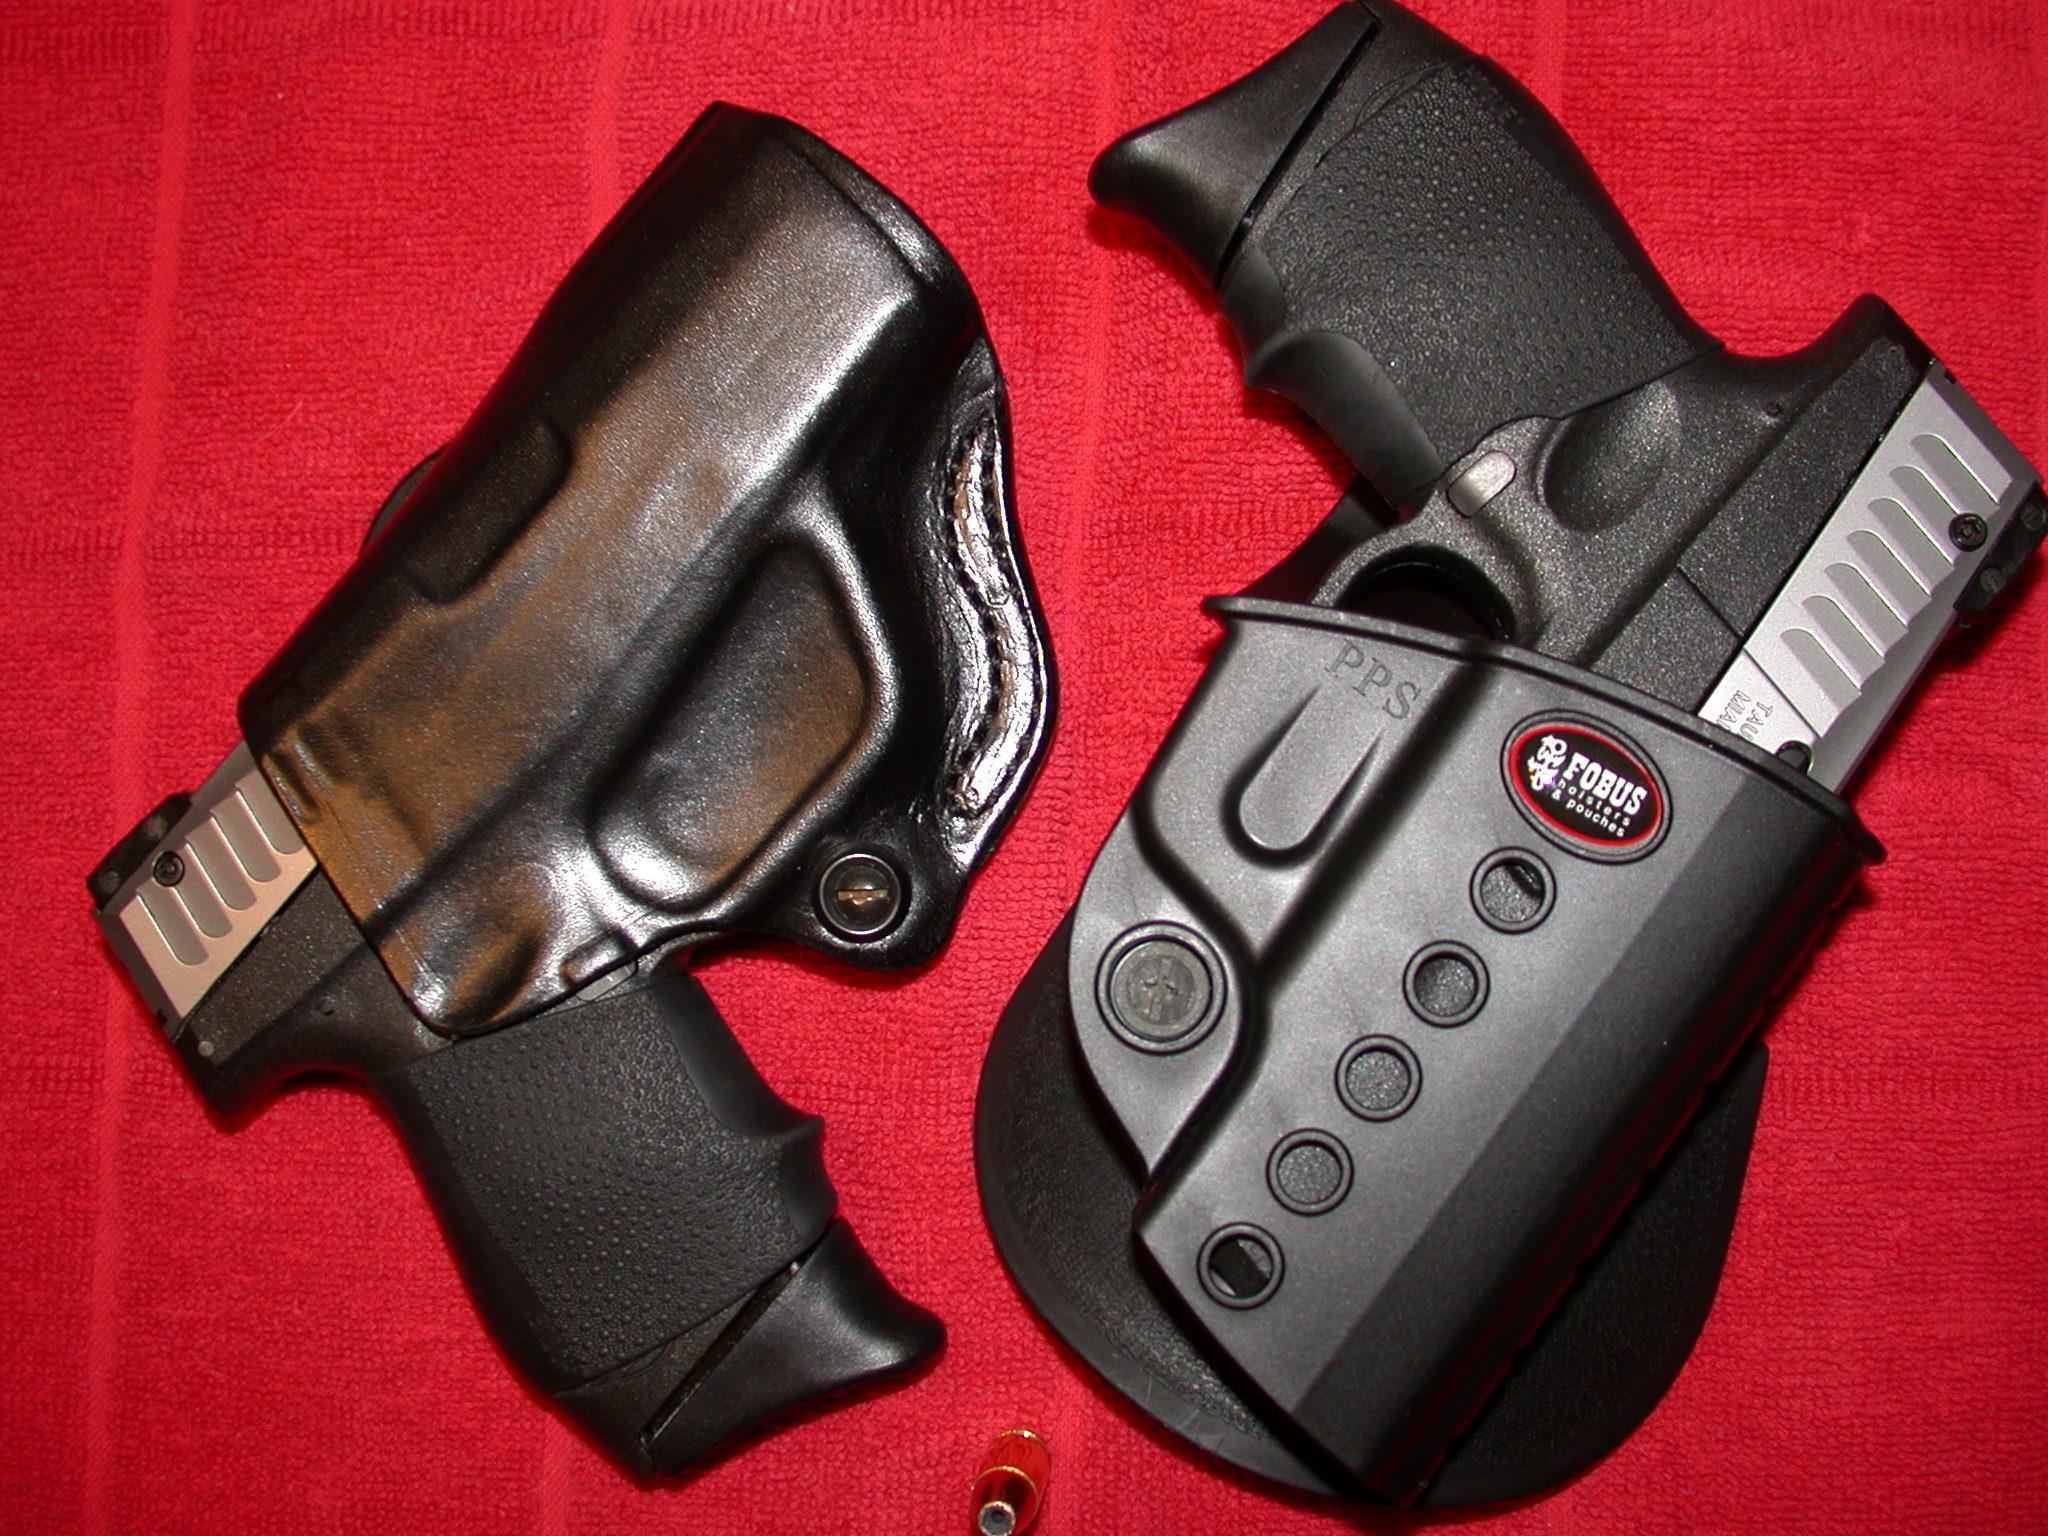 709 slim 9mm pistol - Owb Pt709 740 Holsters